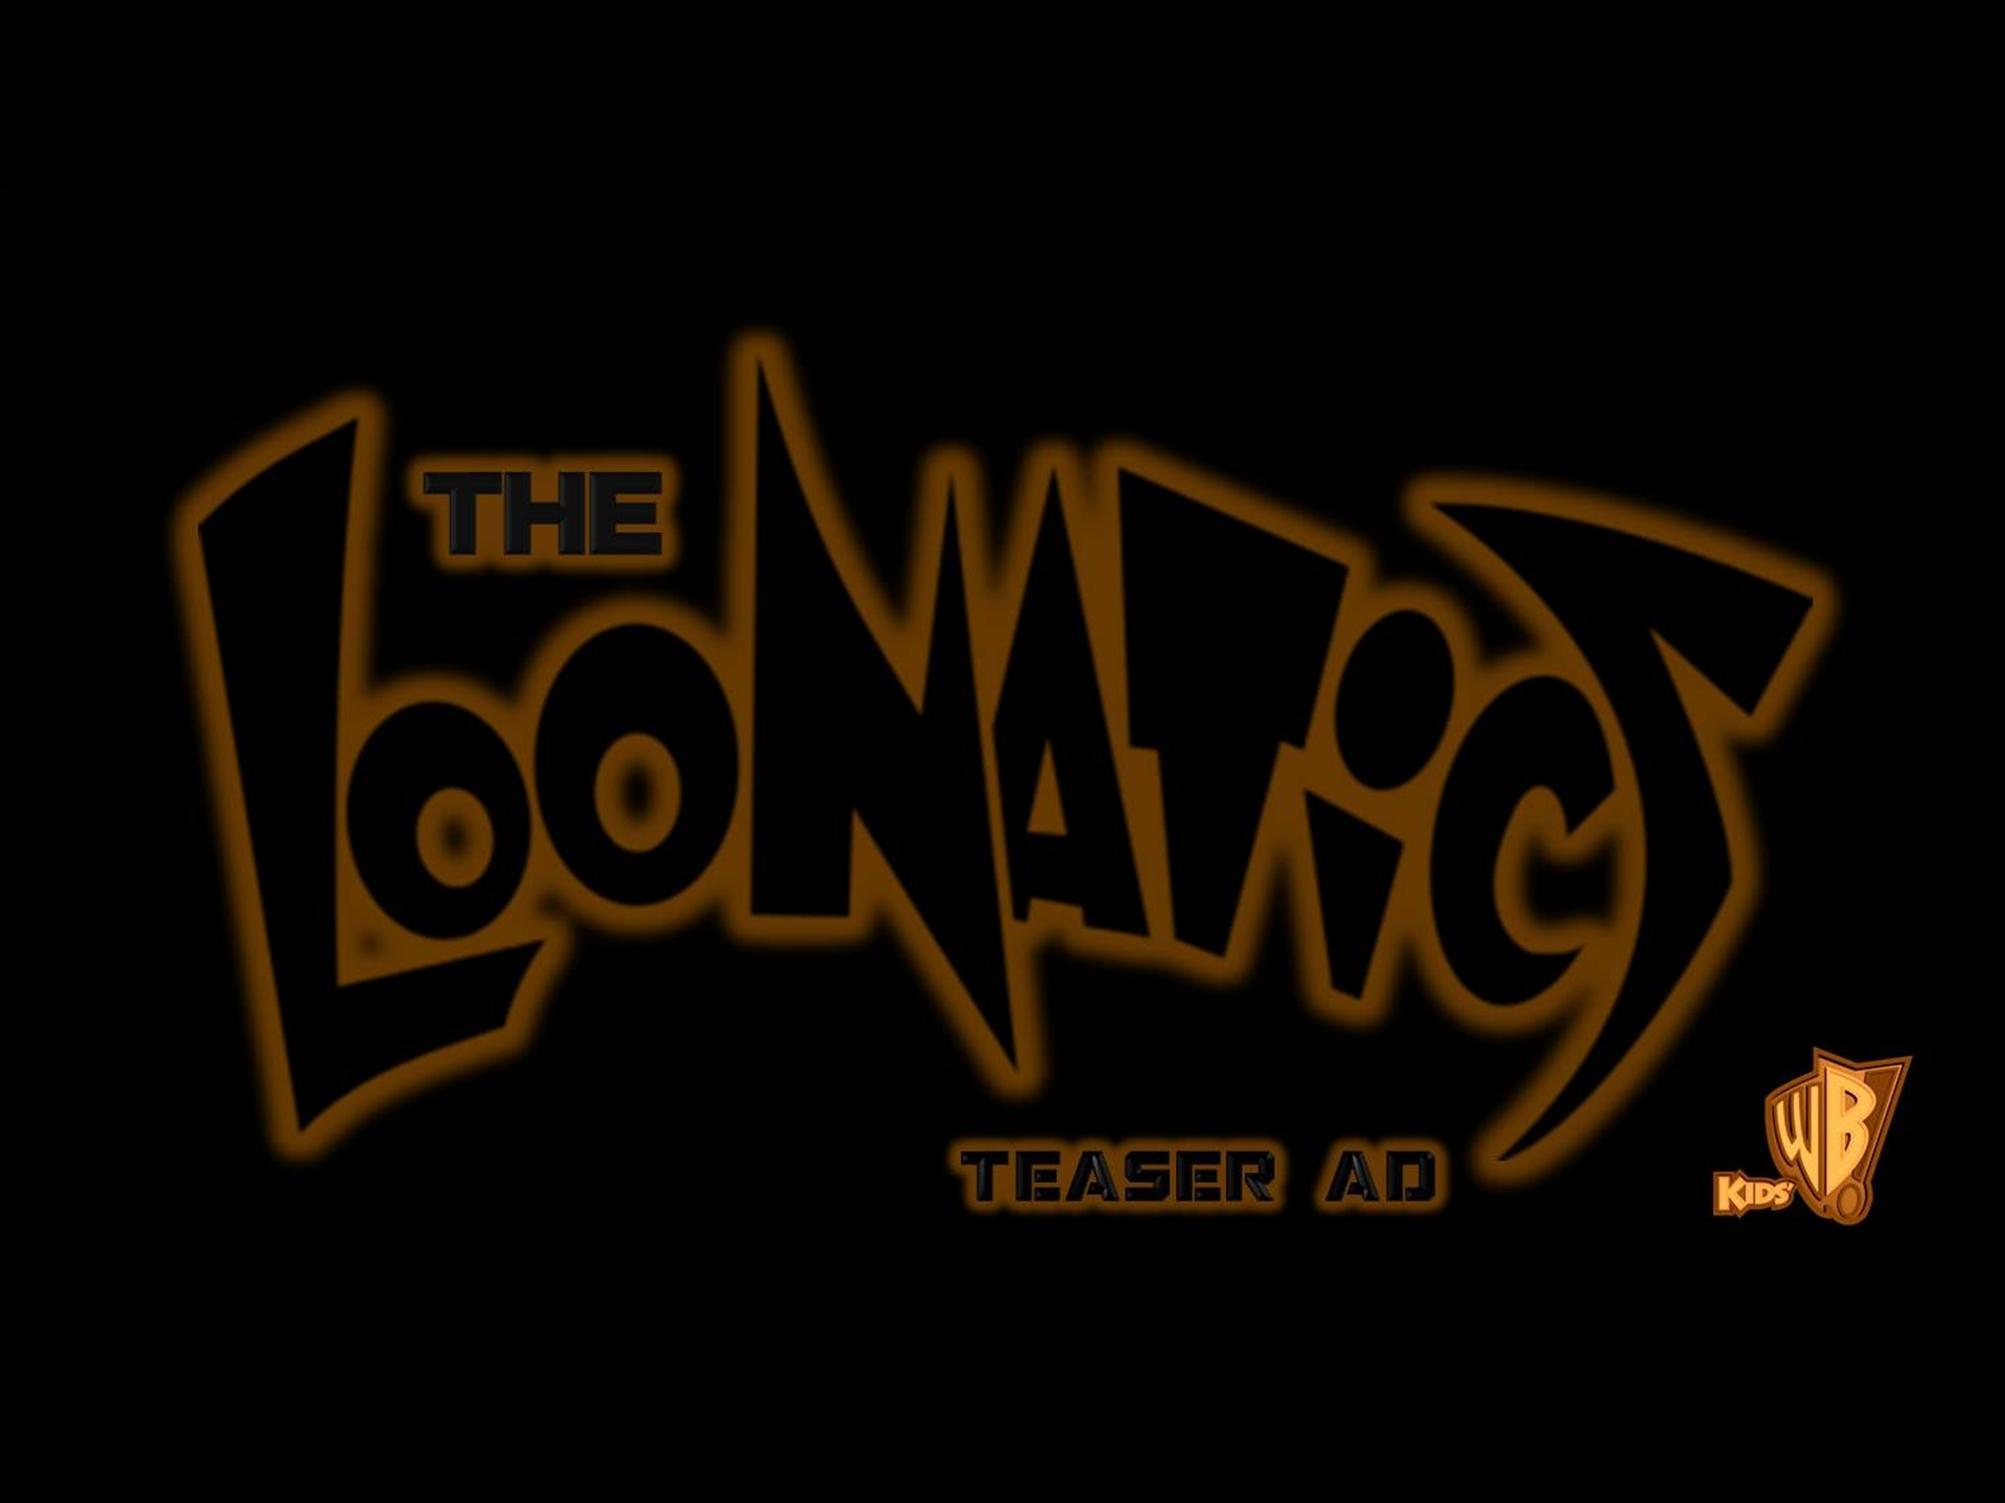 The Loonatics Teaser Ad